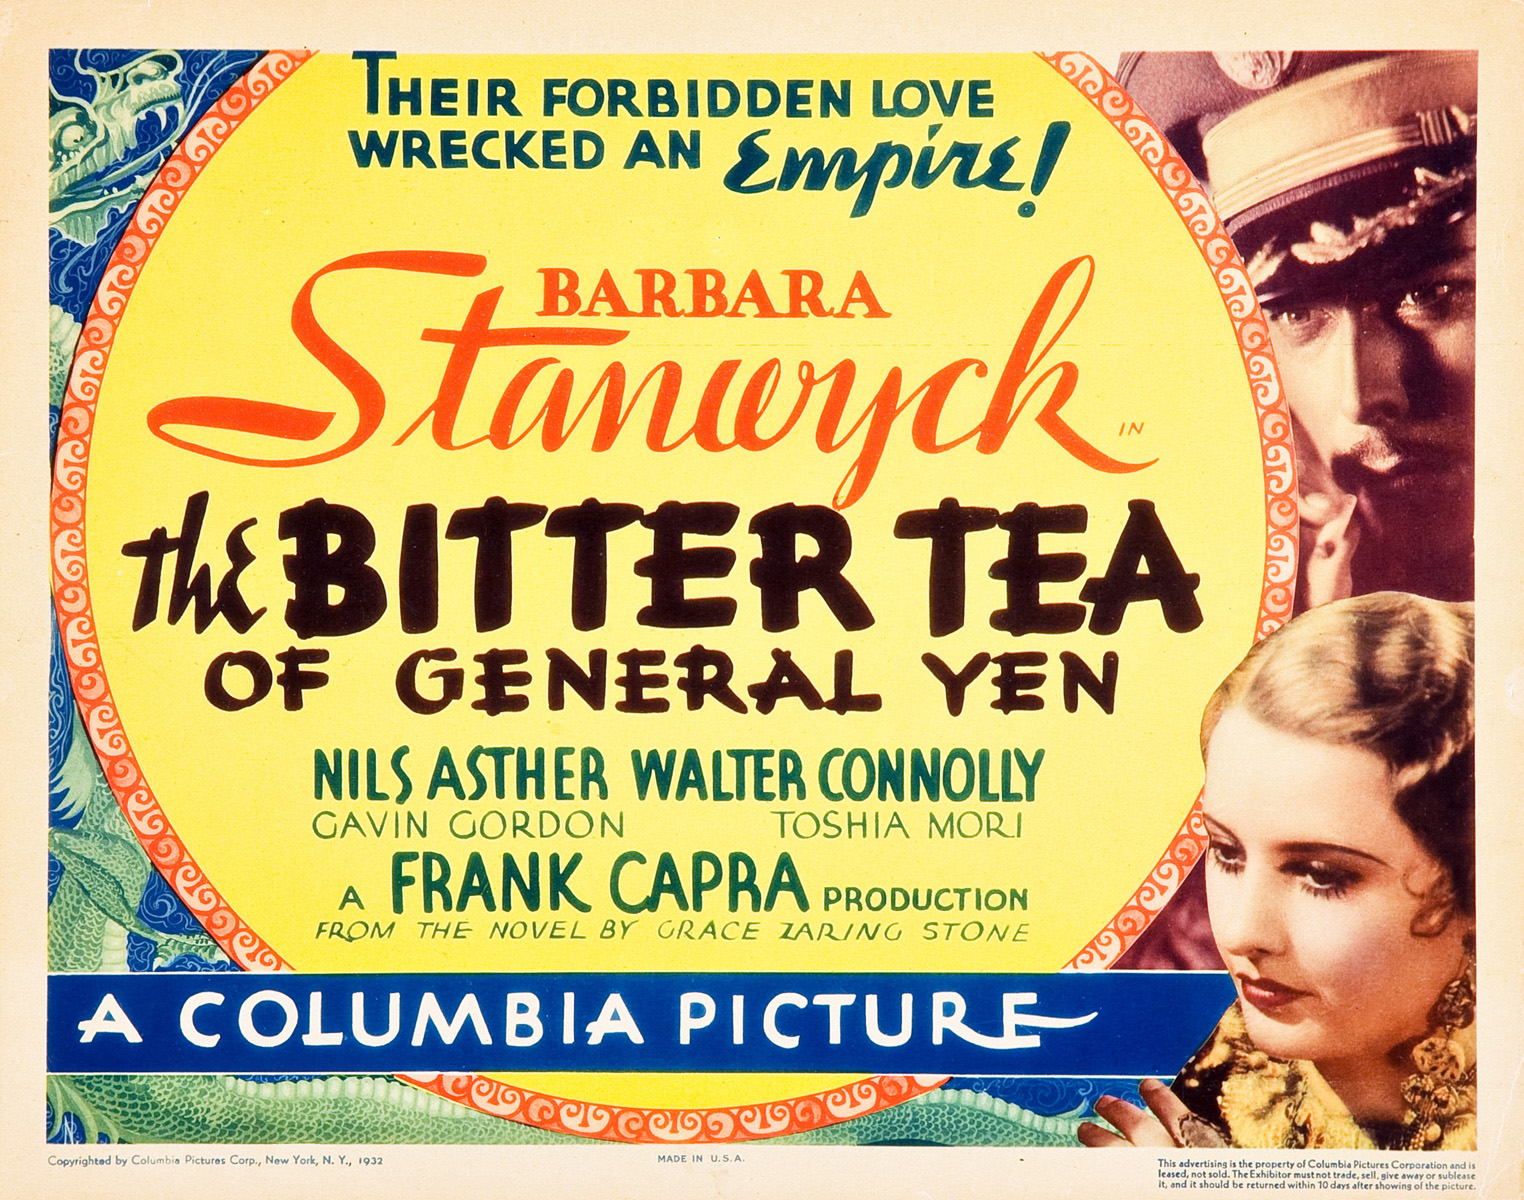 Original-release (1933) lobby card